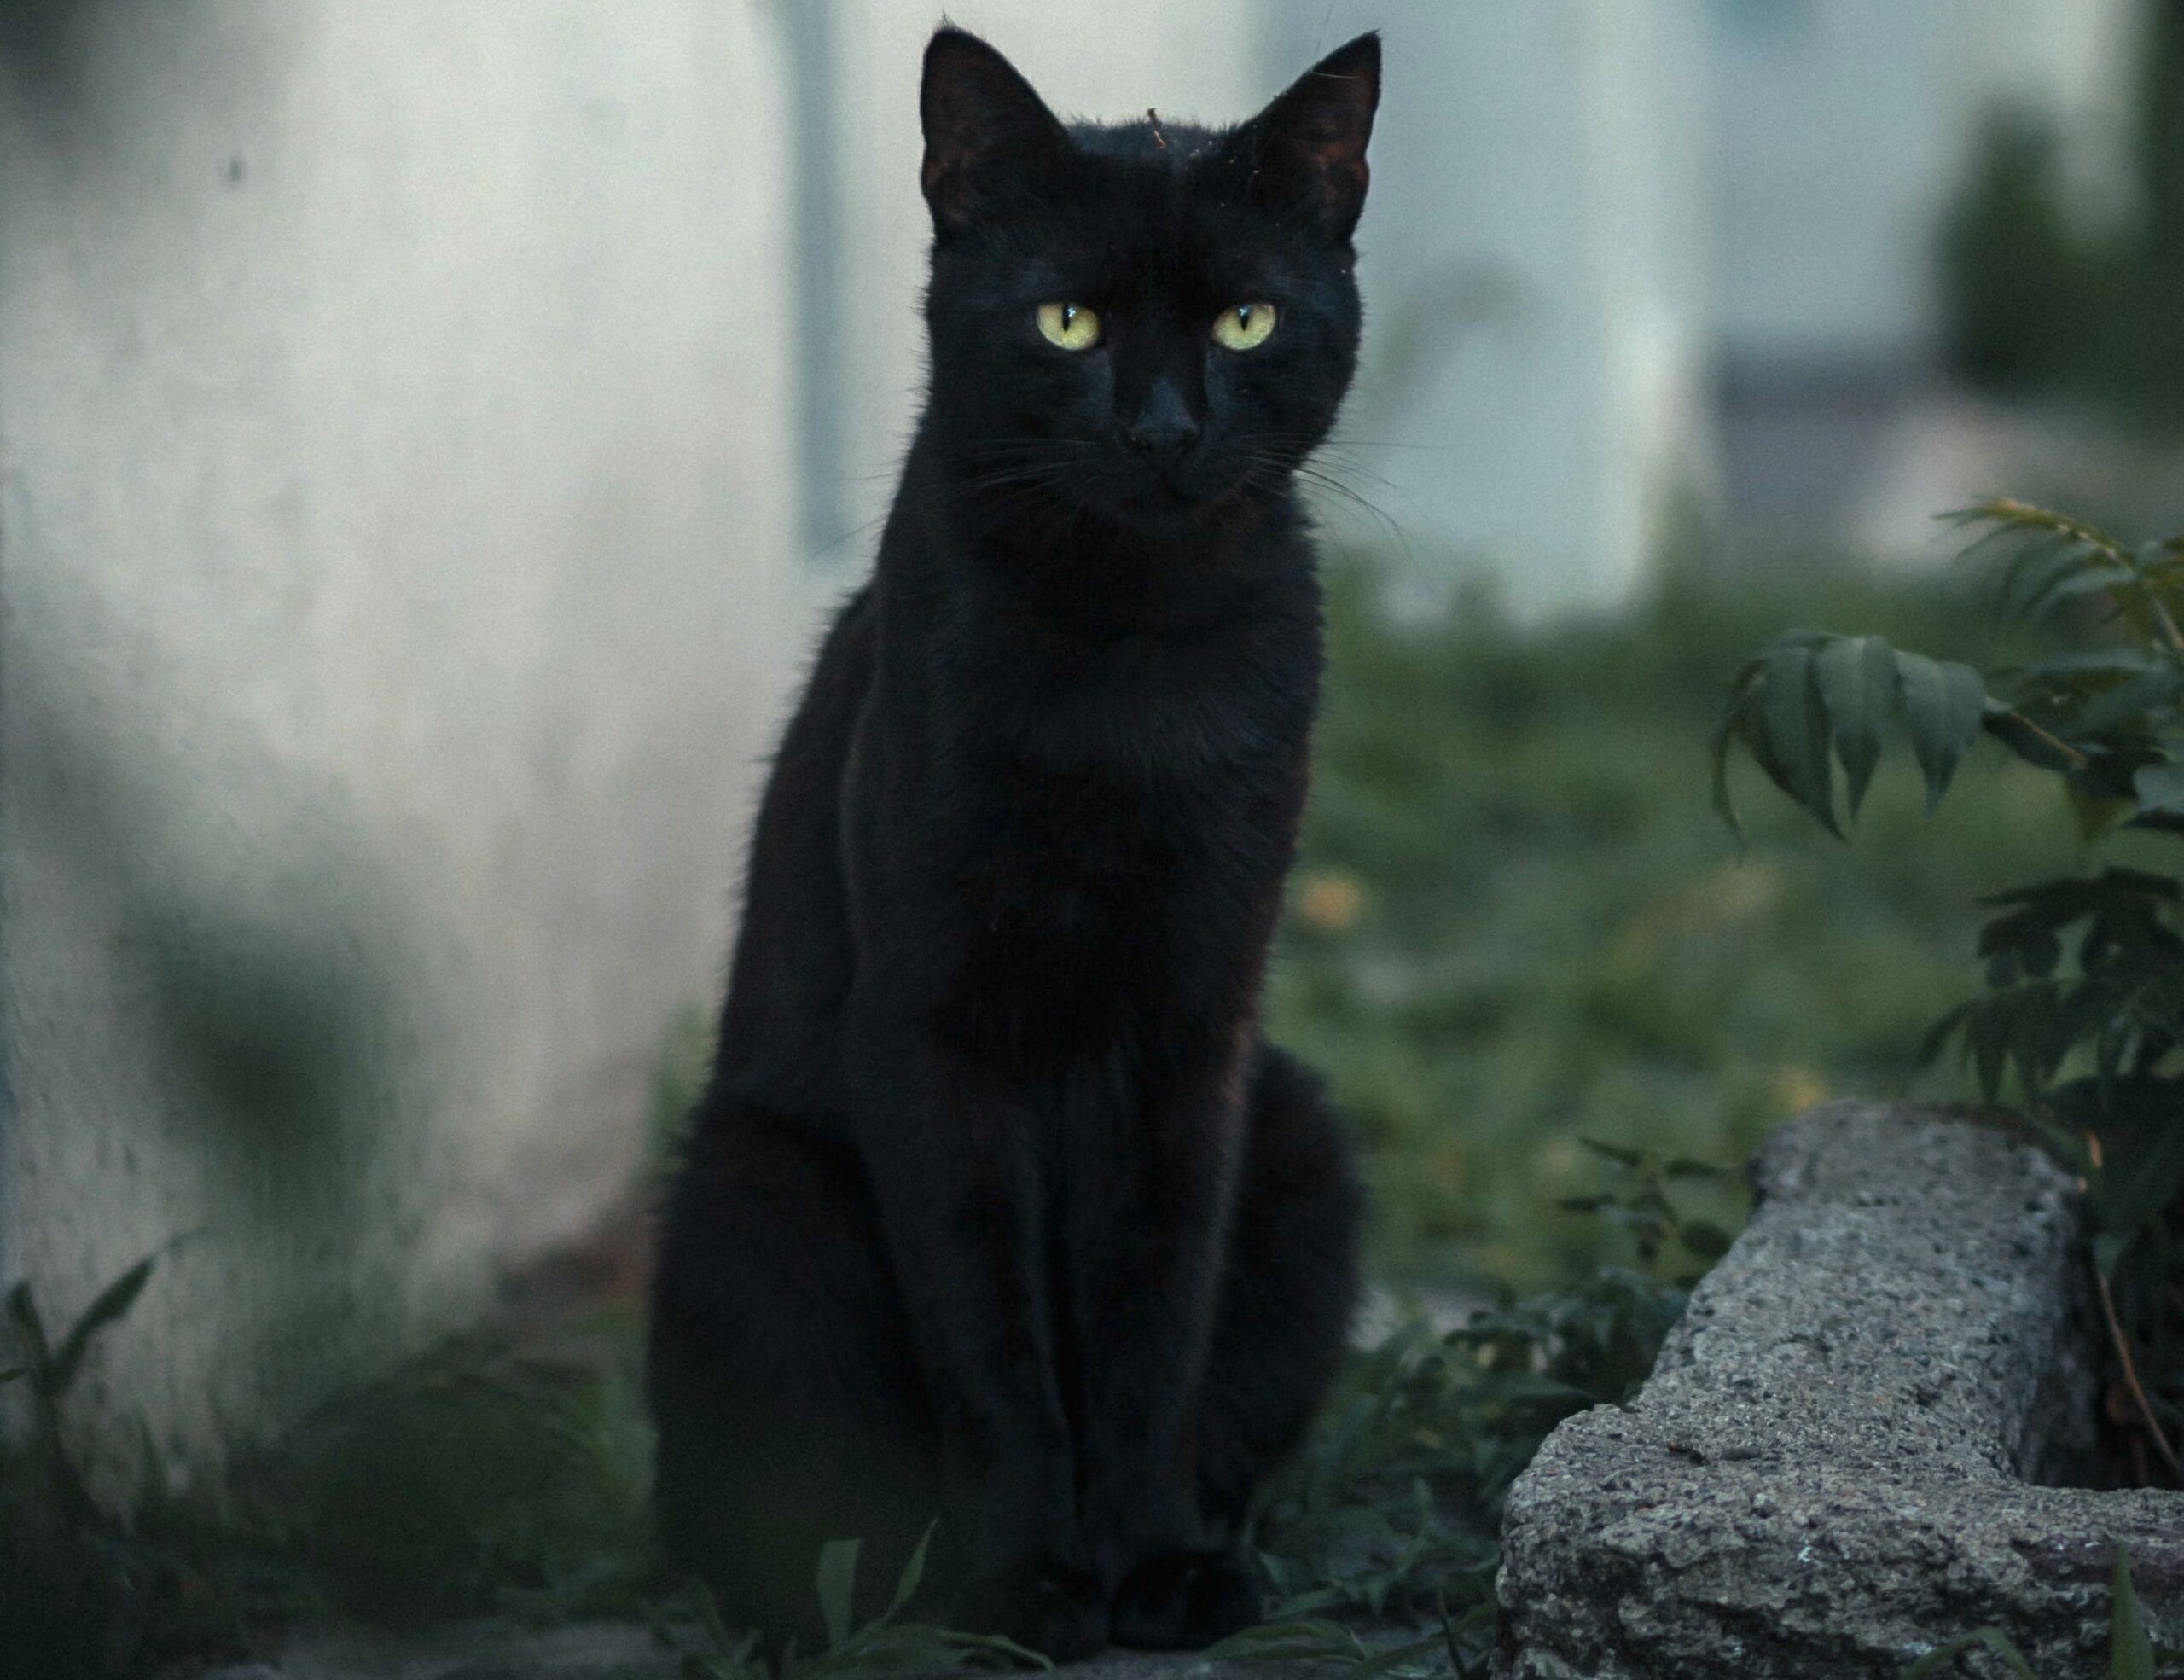 Strangest superstitions